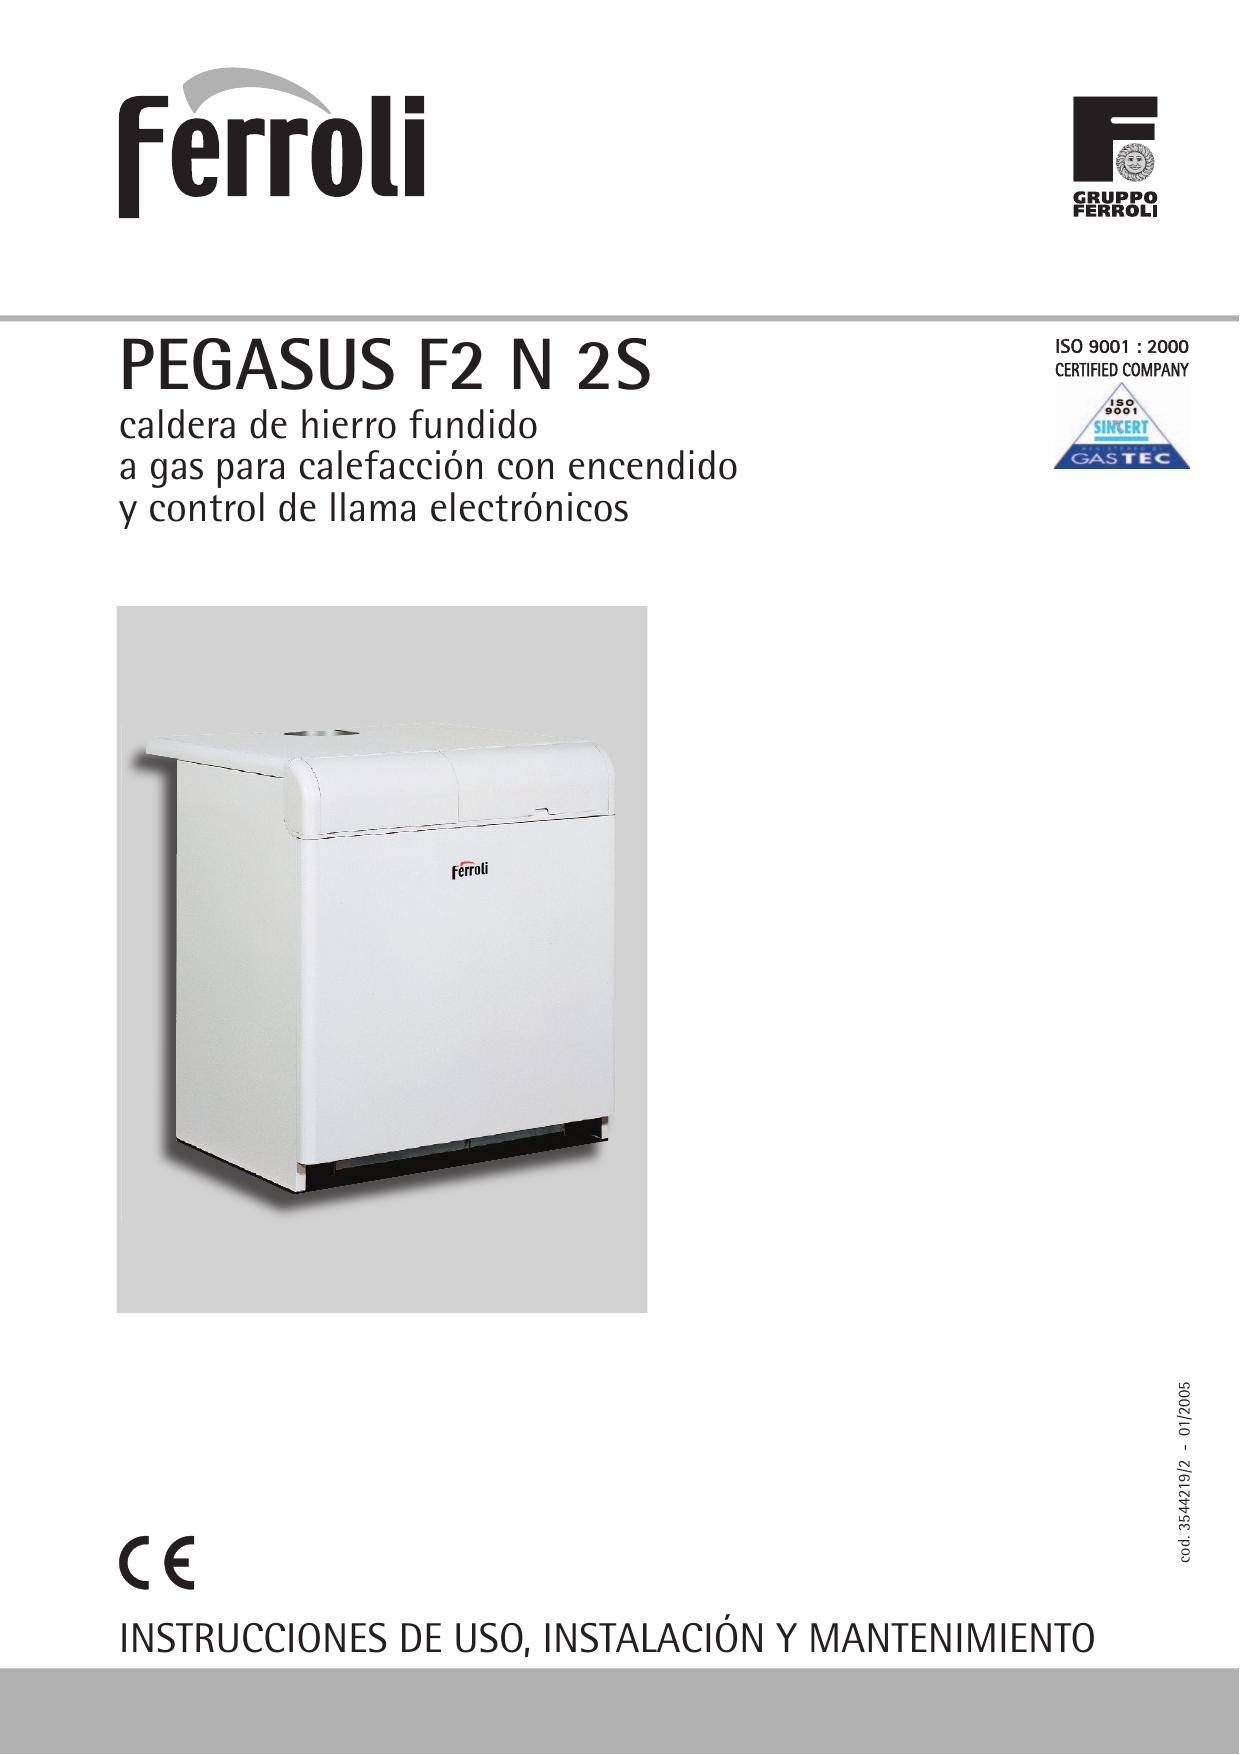 Pegasus F2 N 2s Repuestos Ferroli Alicante